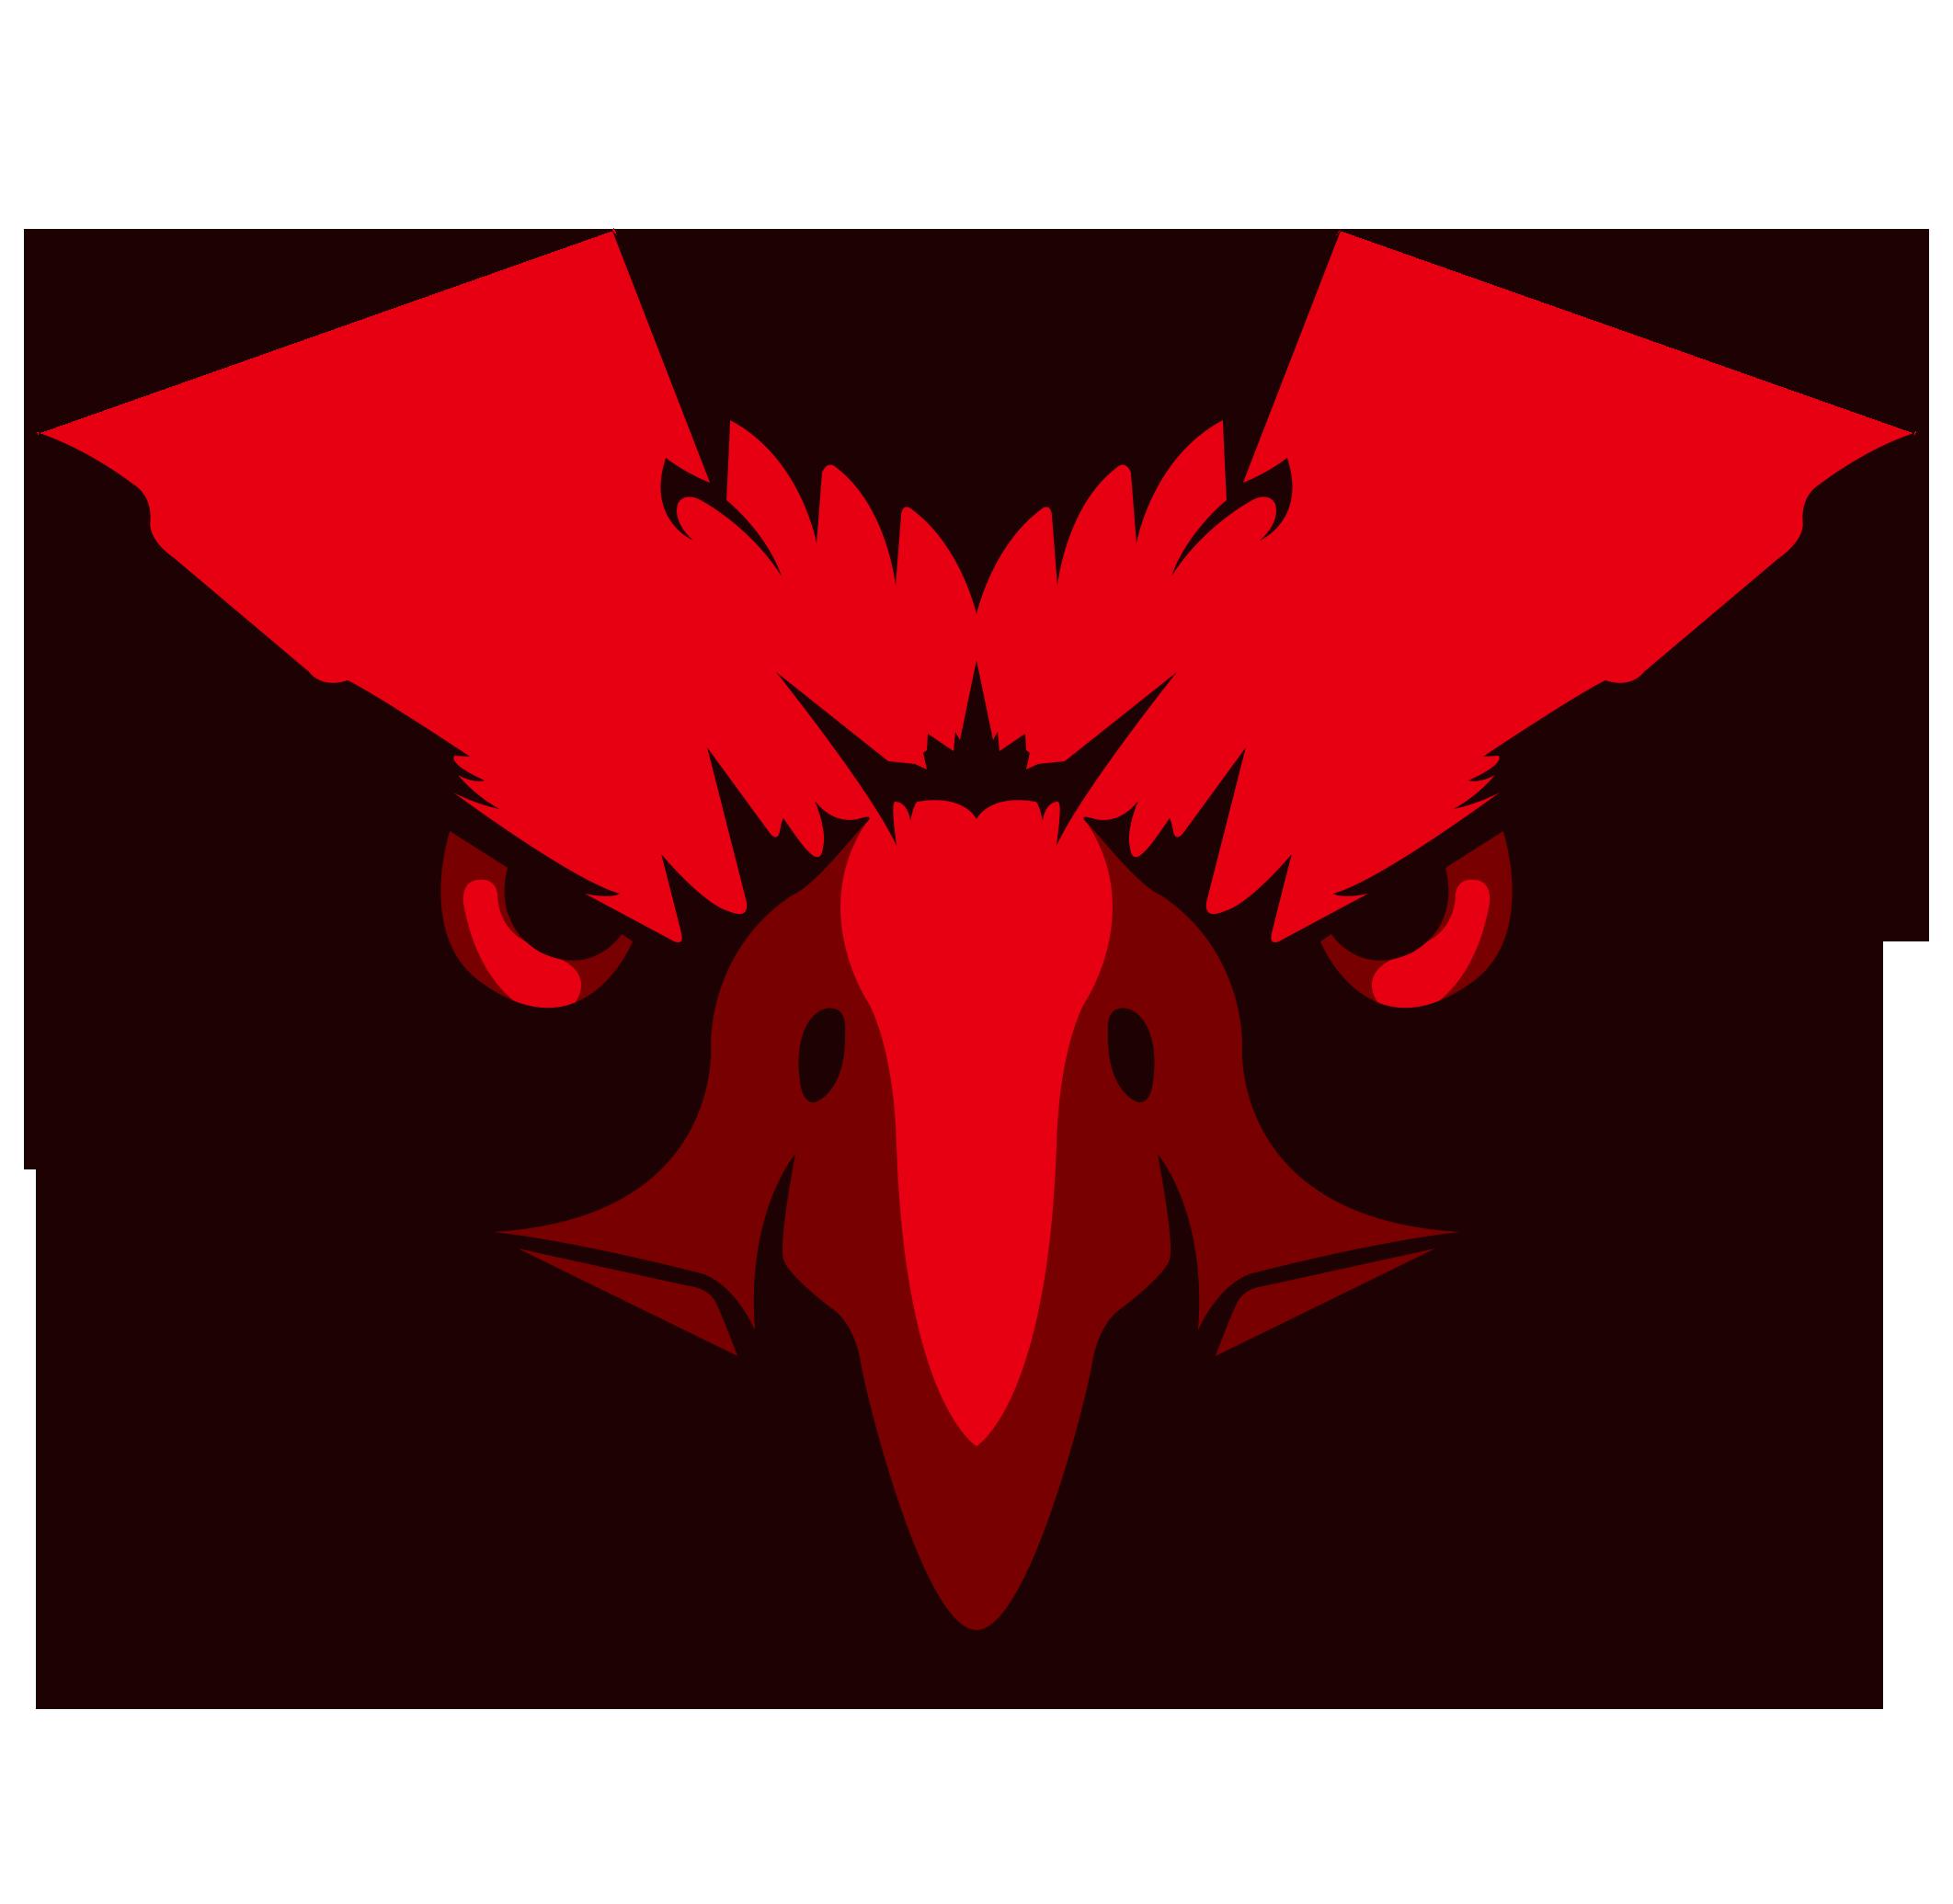 doubutsu sentai zyuohger zyuoh eagle logo color by raidenzein on